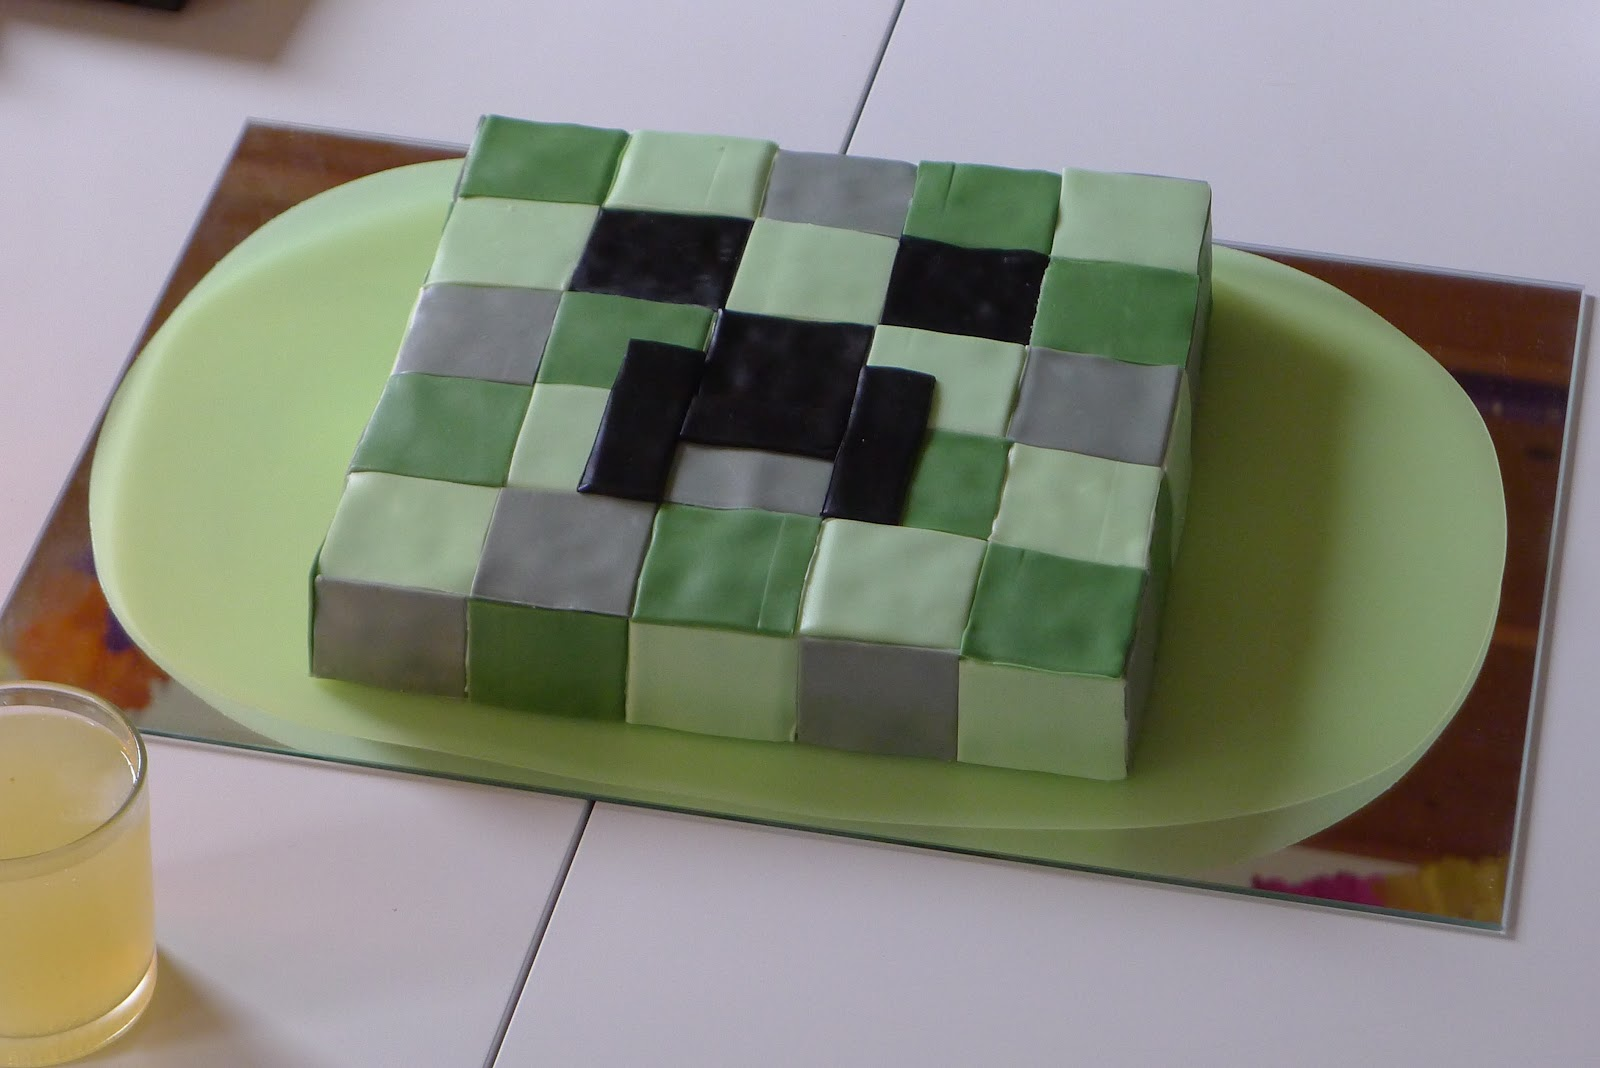 Daan's birthday cake: a Minecraft Creeper.